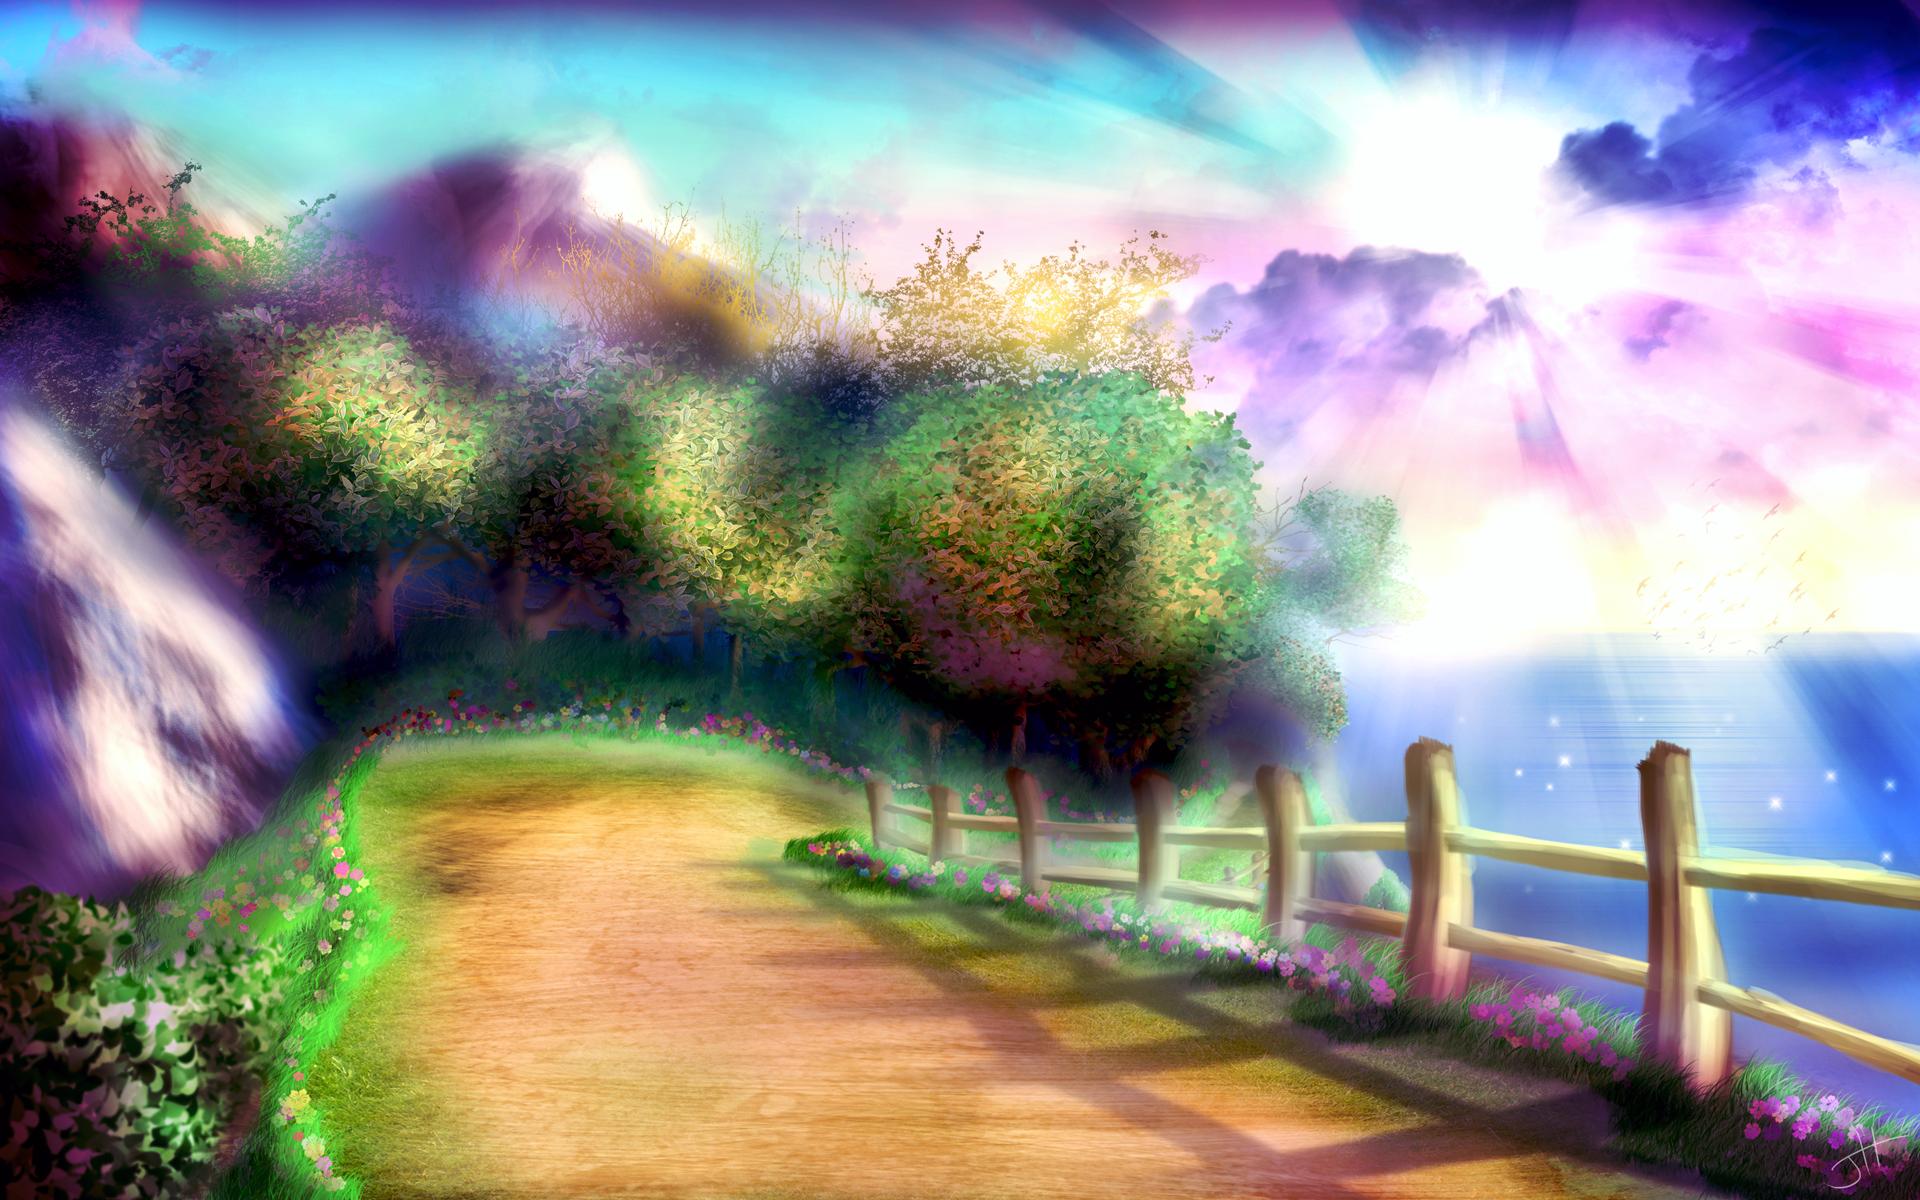 The Coastal Pathway